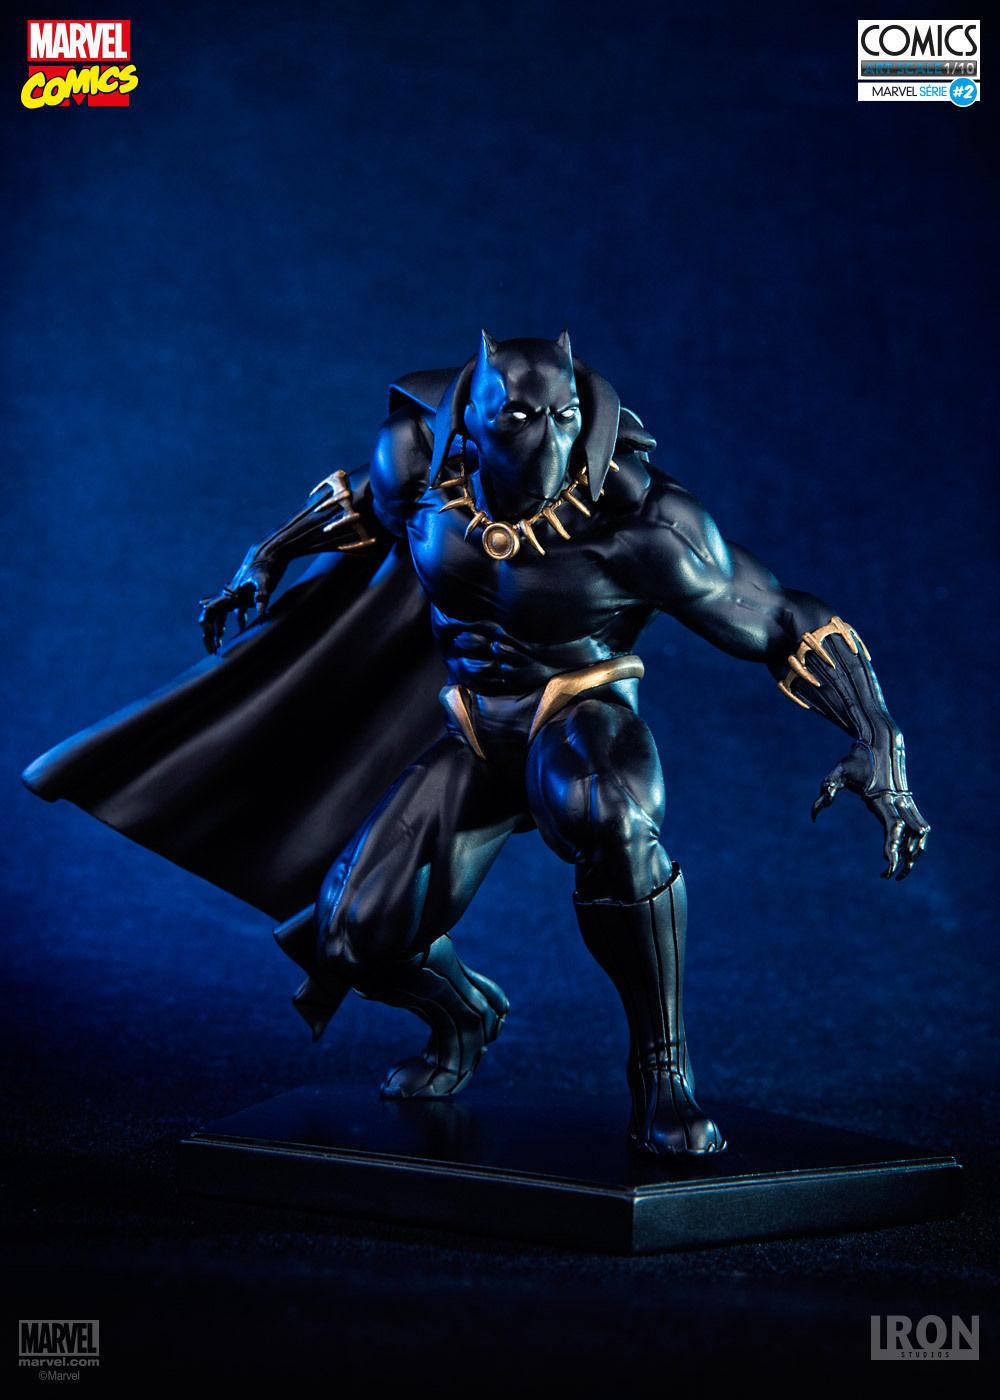 Marvel Comics 1/10 Scale Art Statue - Black Panther